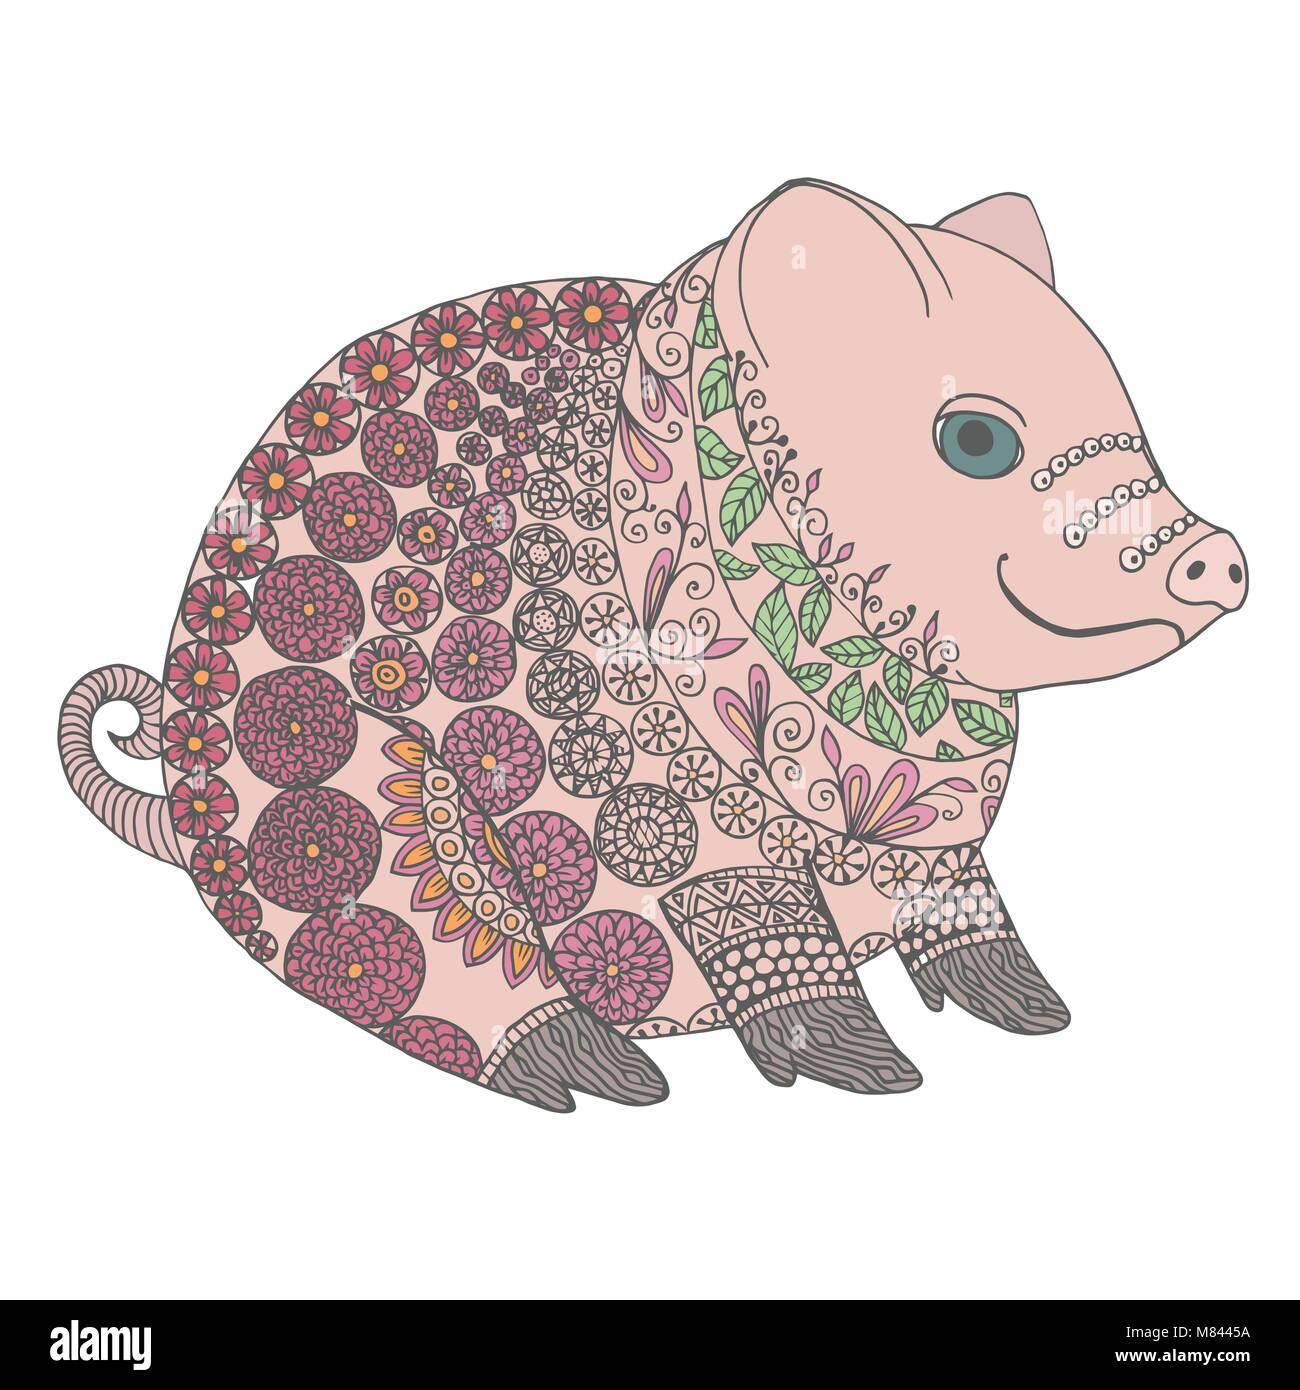 Illustration Little Pig Stockfotos & Illustration Little Pig Bilder ...